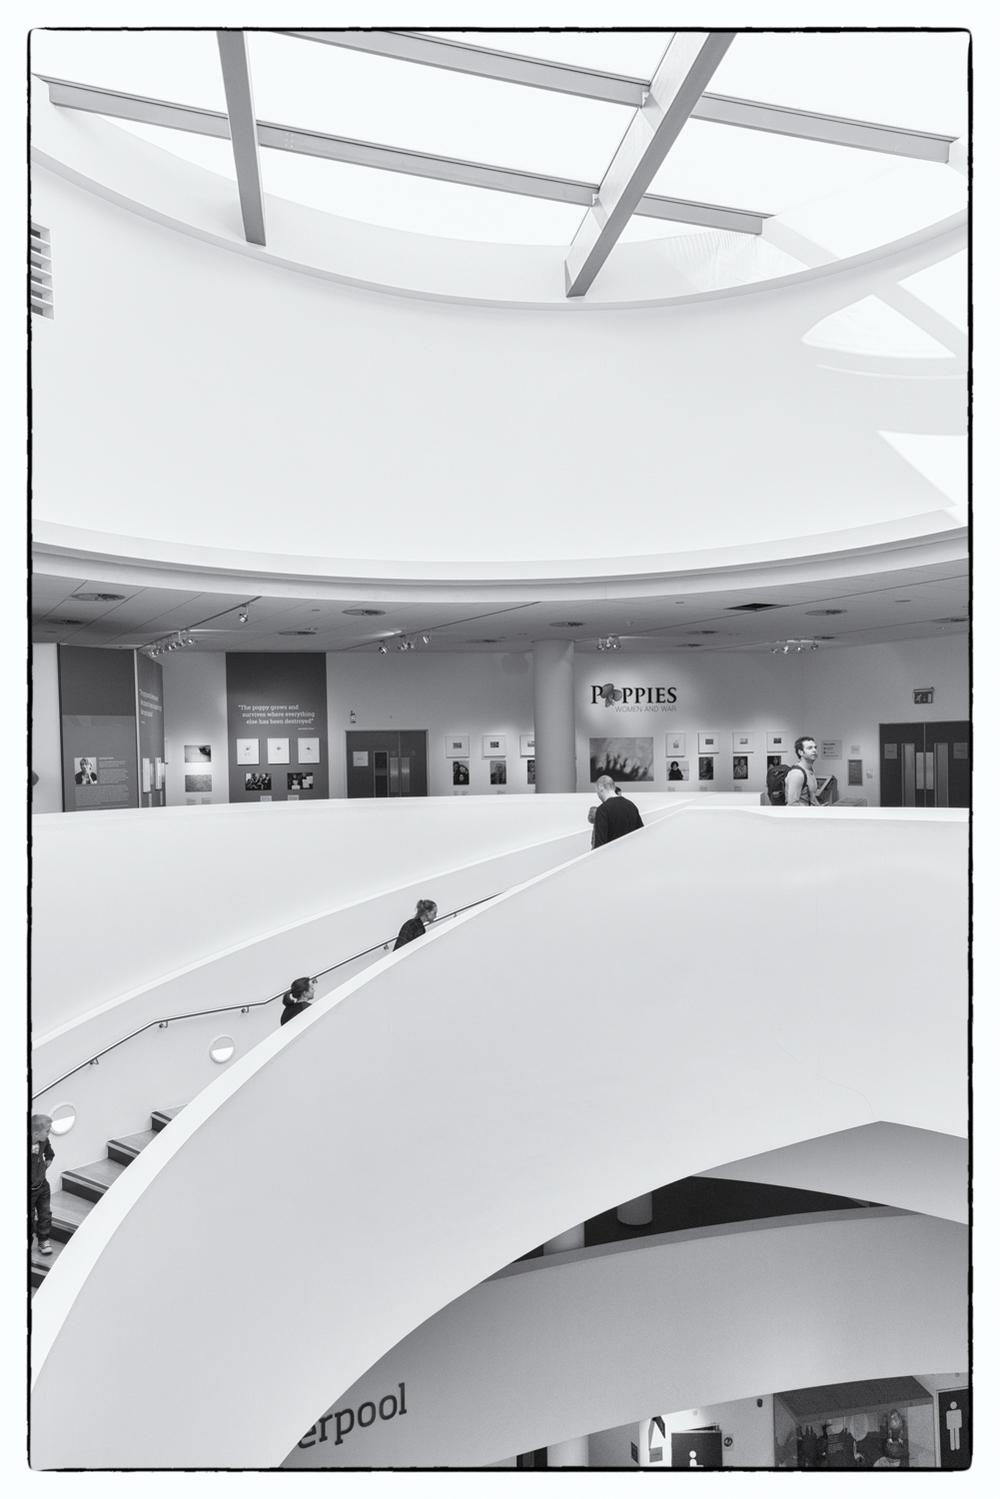 MuseumofLiverpoolSmall--3.jpg